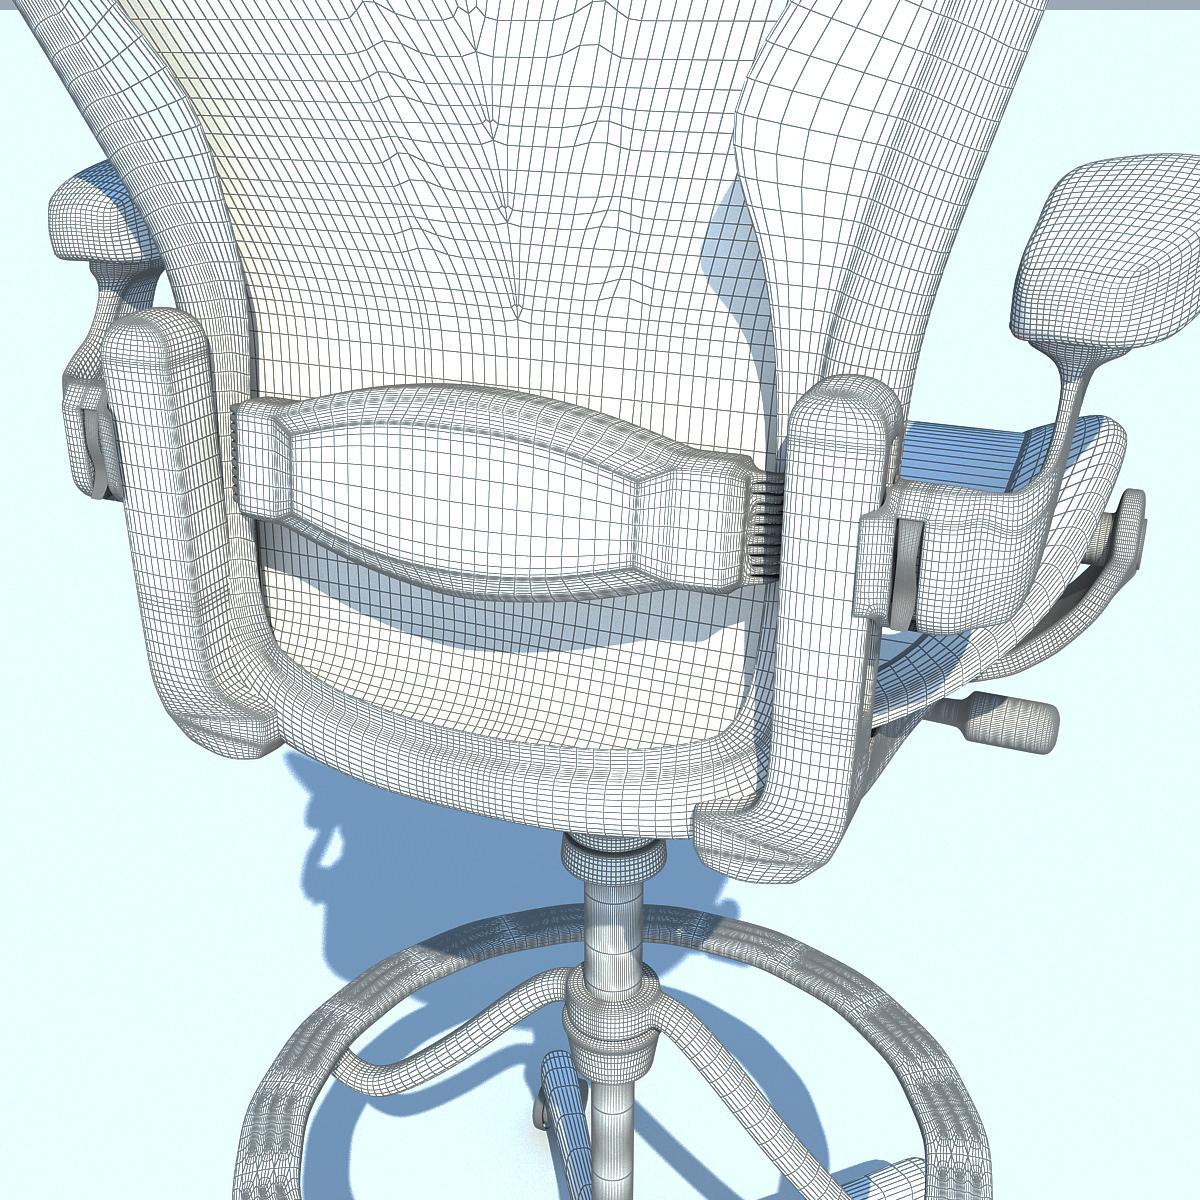 ... aeron work stool chair herman miller 3d model max obj 3ds fbx c4d ma mb 4 ...  sc 1 st  CGTrader.com & 3D model Aeron Work Stool Chair Herman Miller | CGTrader islam-shia.org